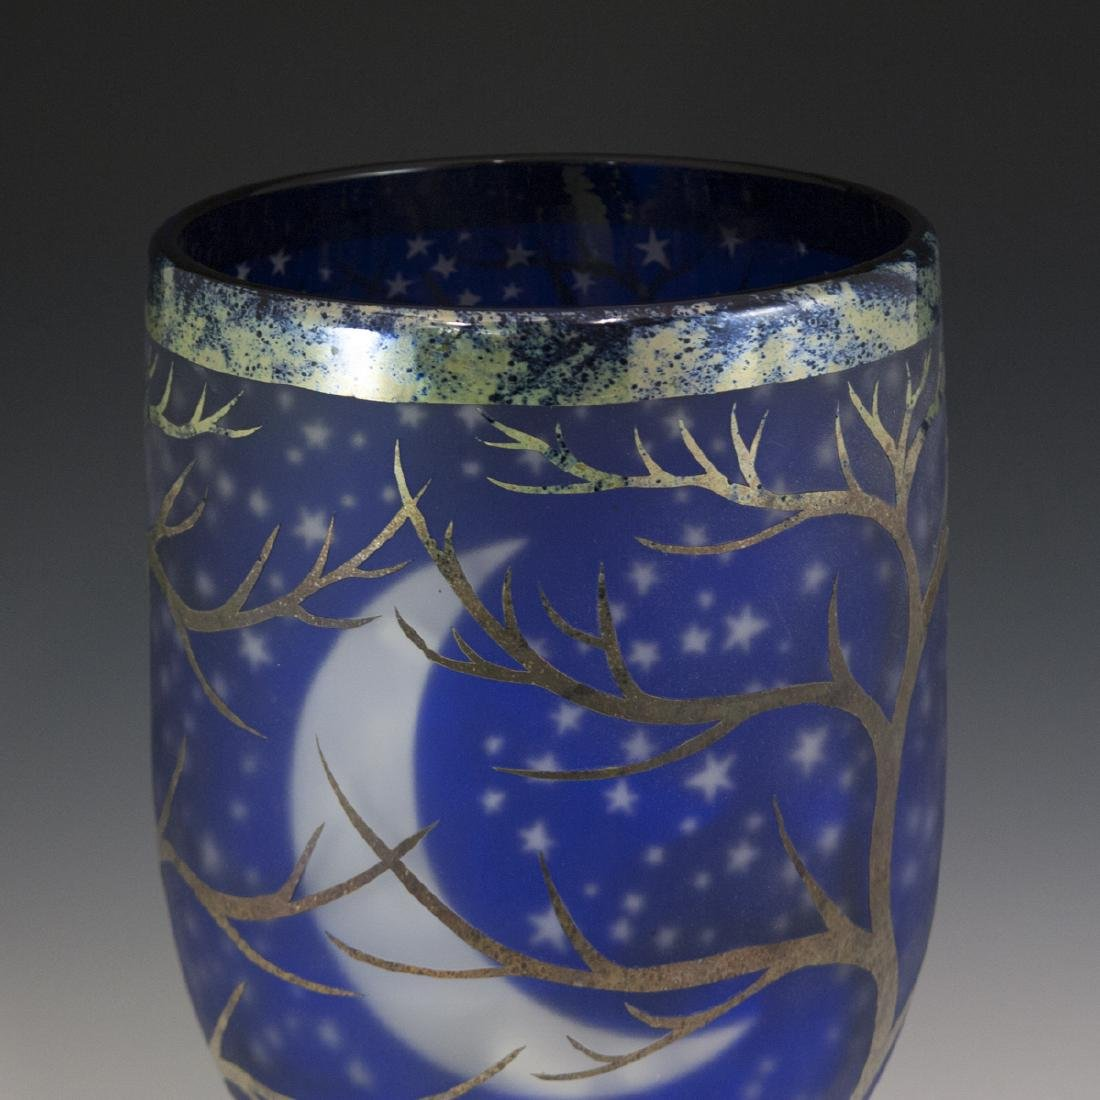 Large Duncan McClellan Art Glass Vase - 4